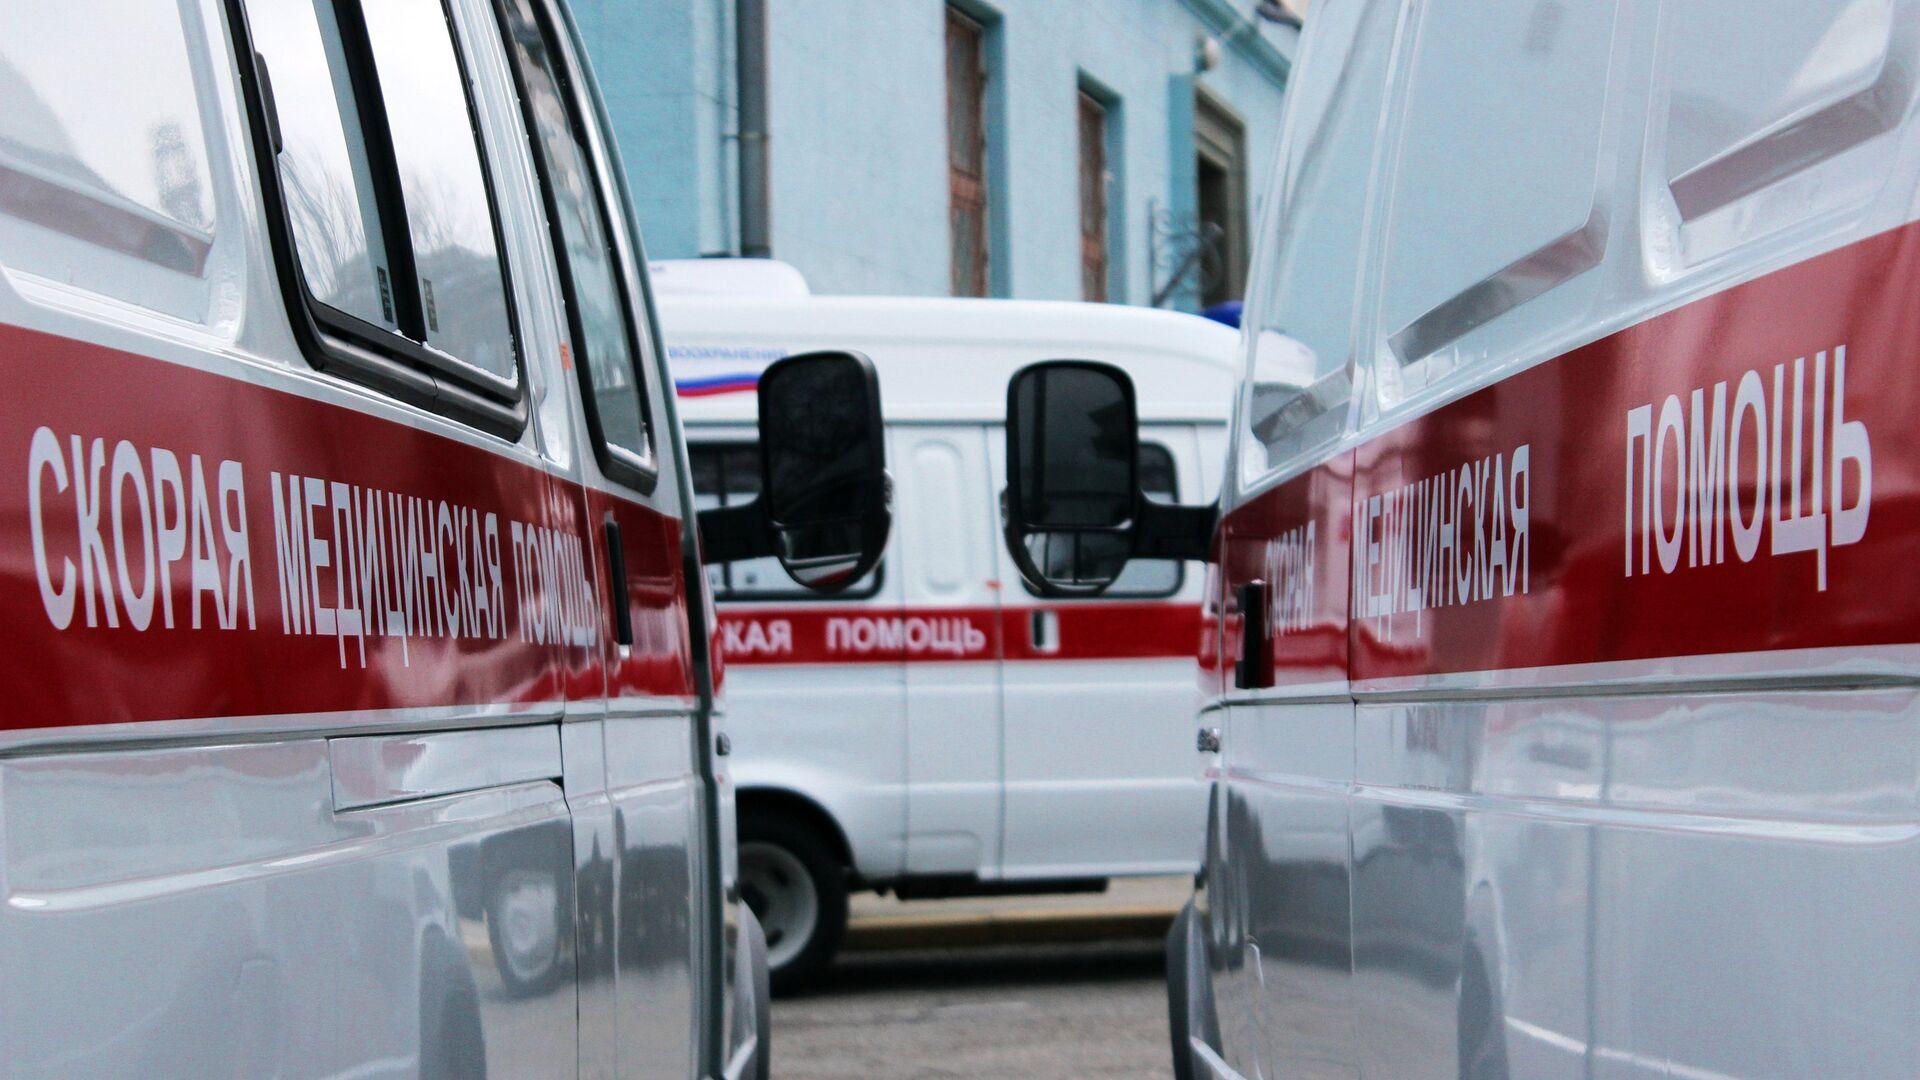 Ambulance vehicles - Sputnik International, 1920, 24.07.2021